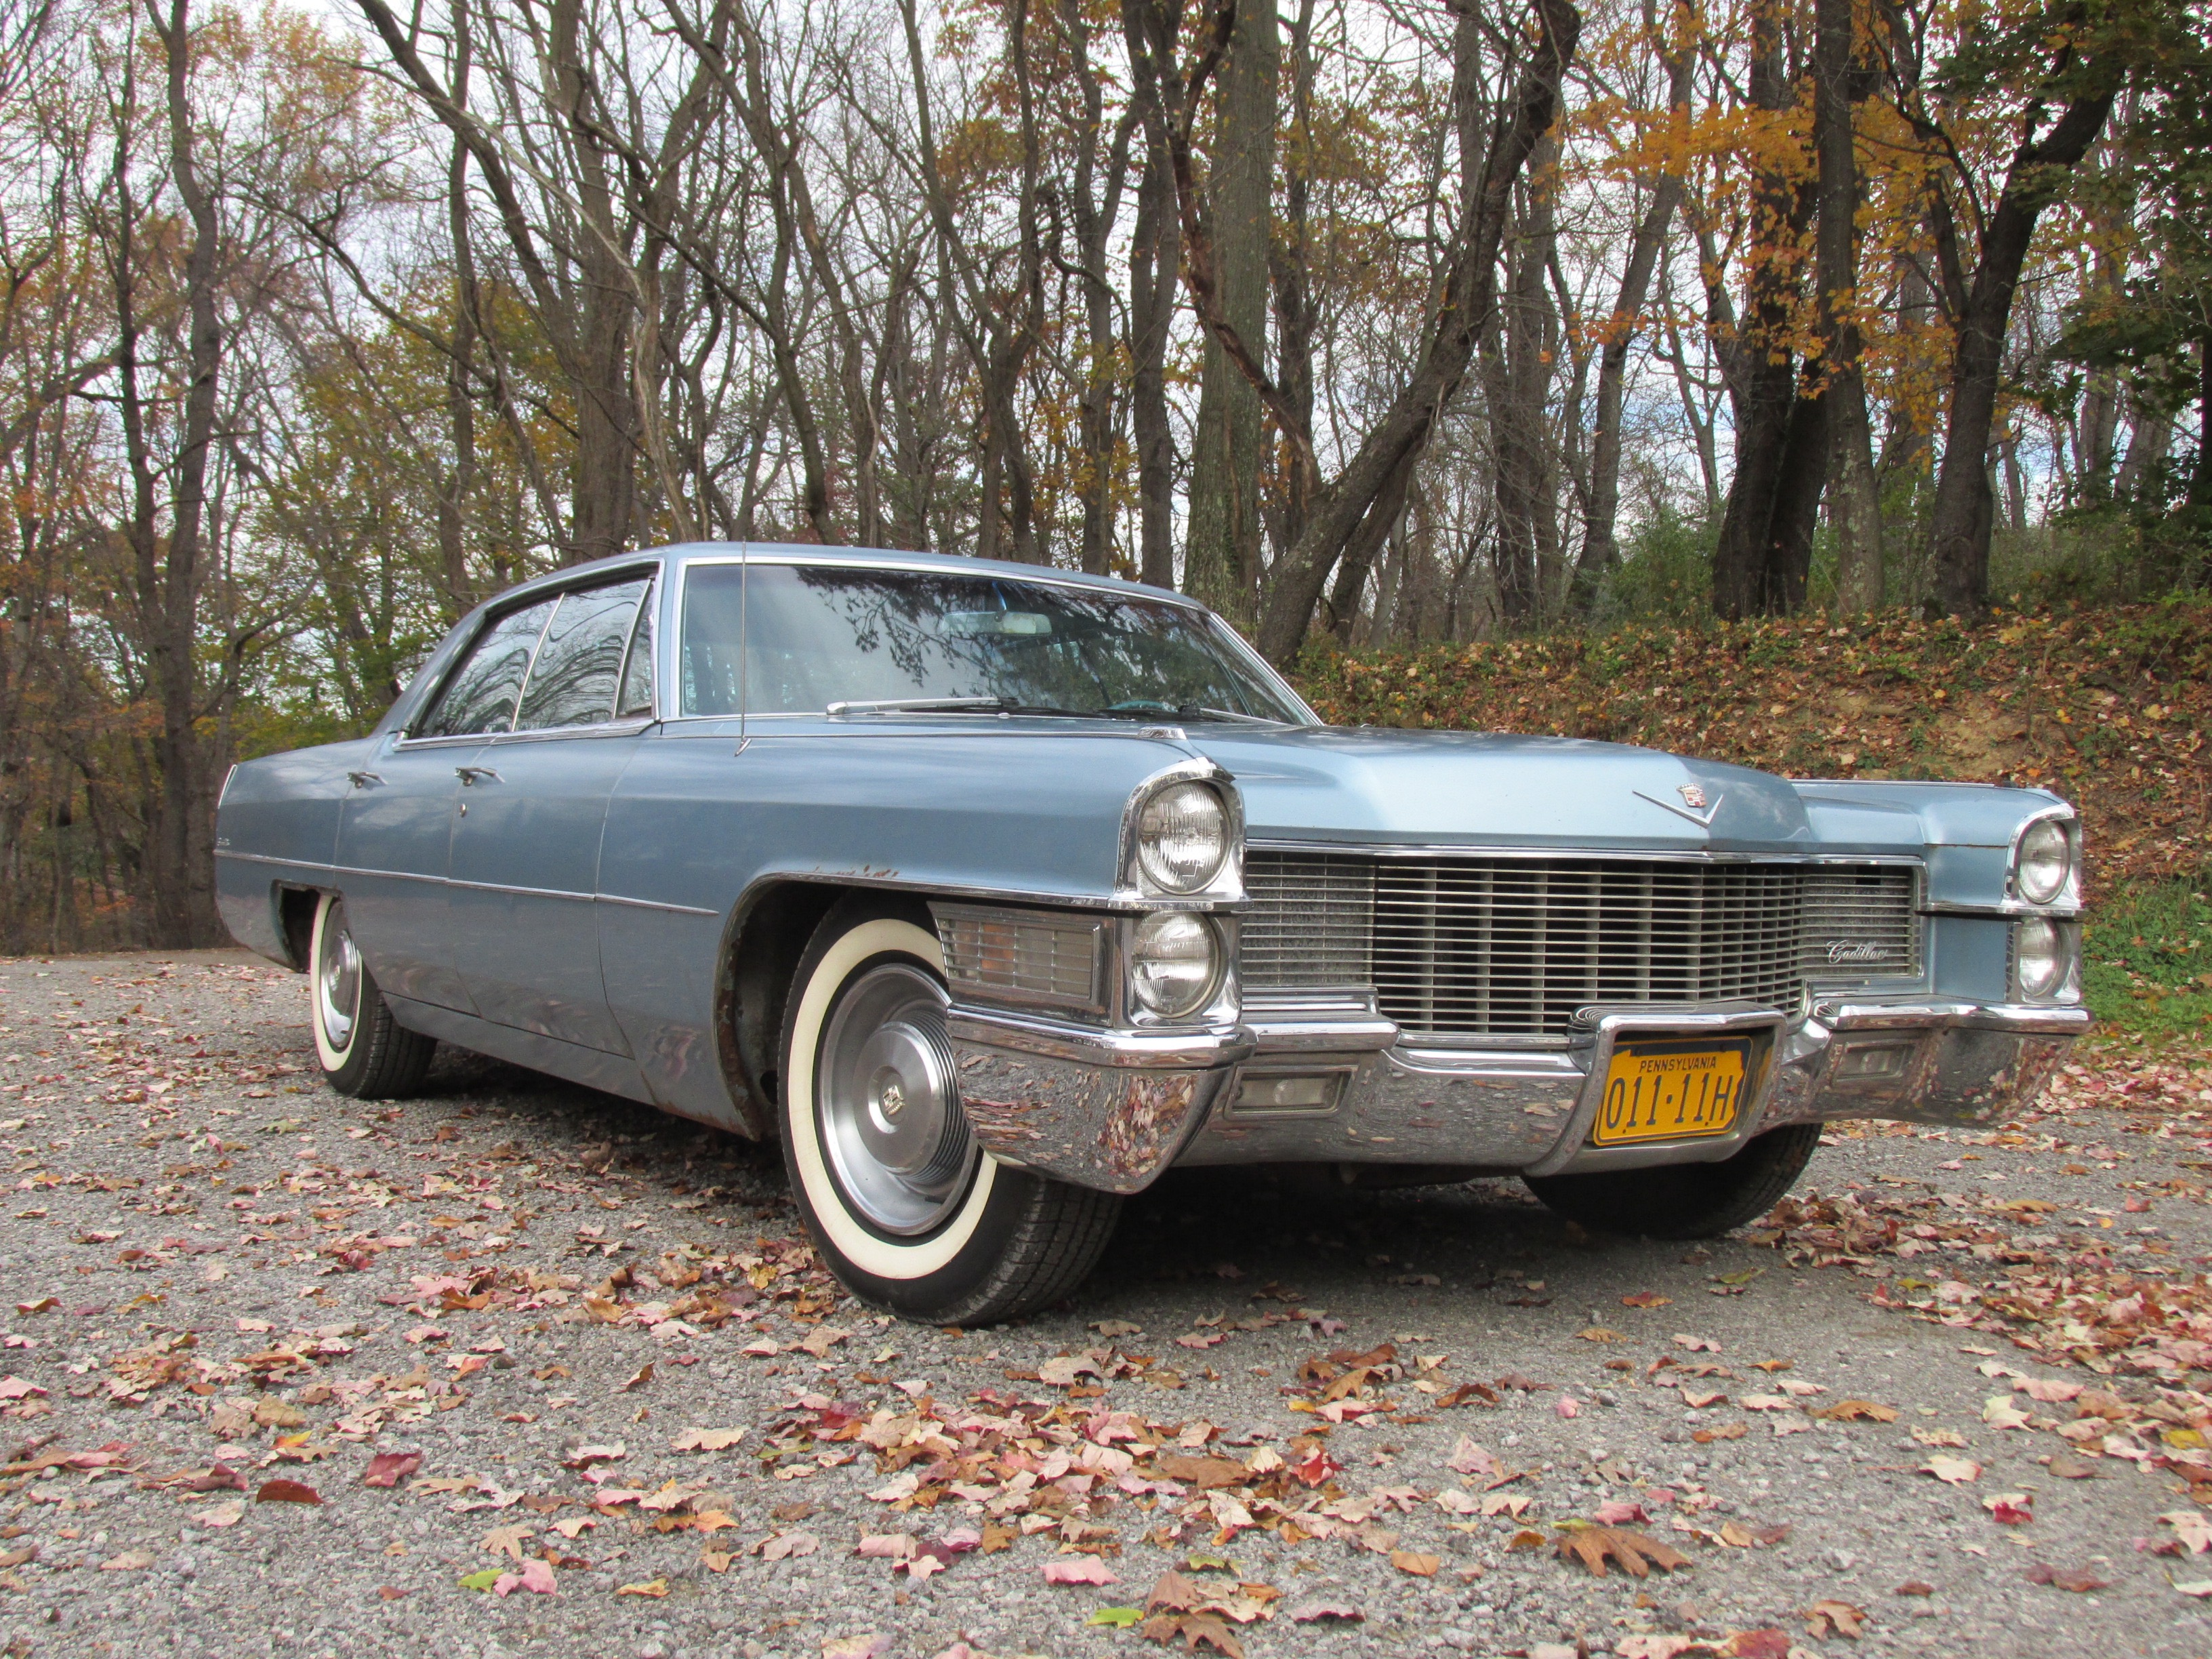 1965 cadillac sedan deville fort pitt classic cars. Black Bedroom Furniture Sets. Home Design Ideas